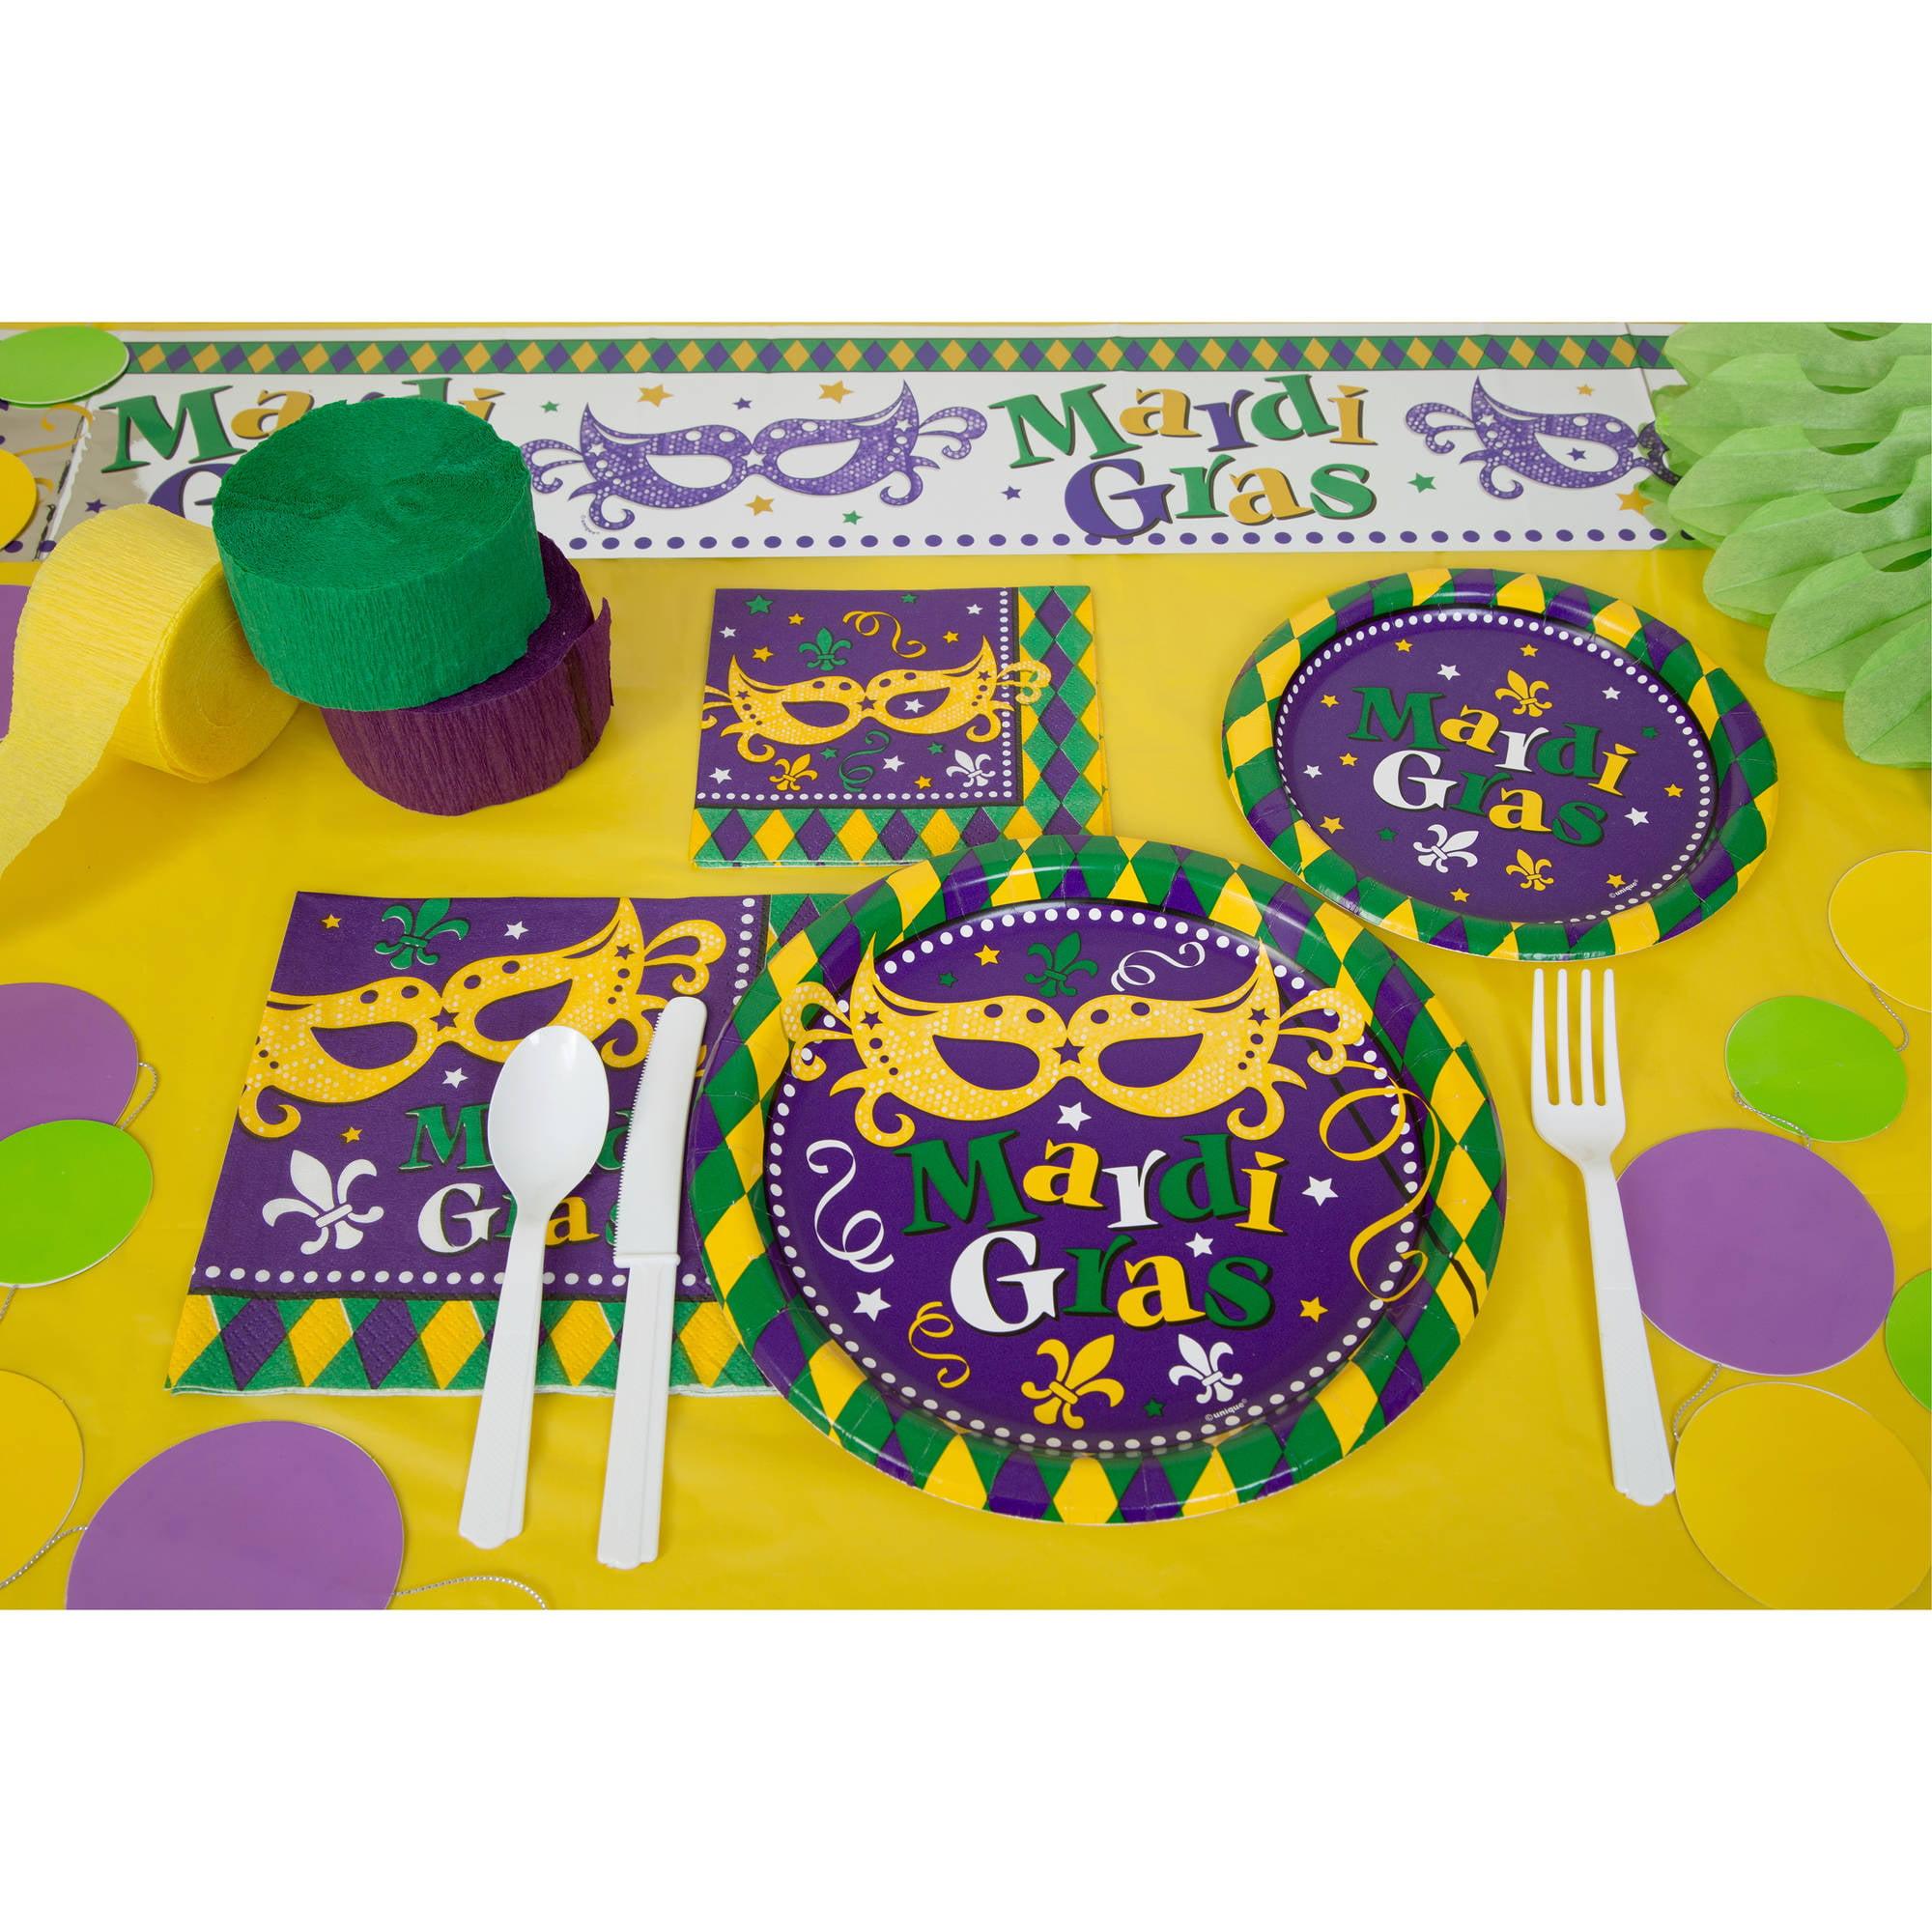 Masquerade Mardi Gras Party Supplies - Walmart.com